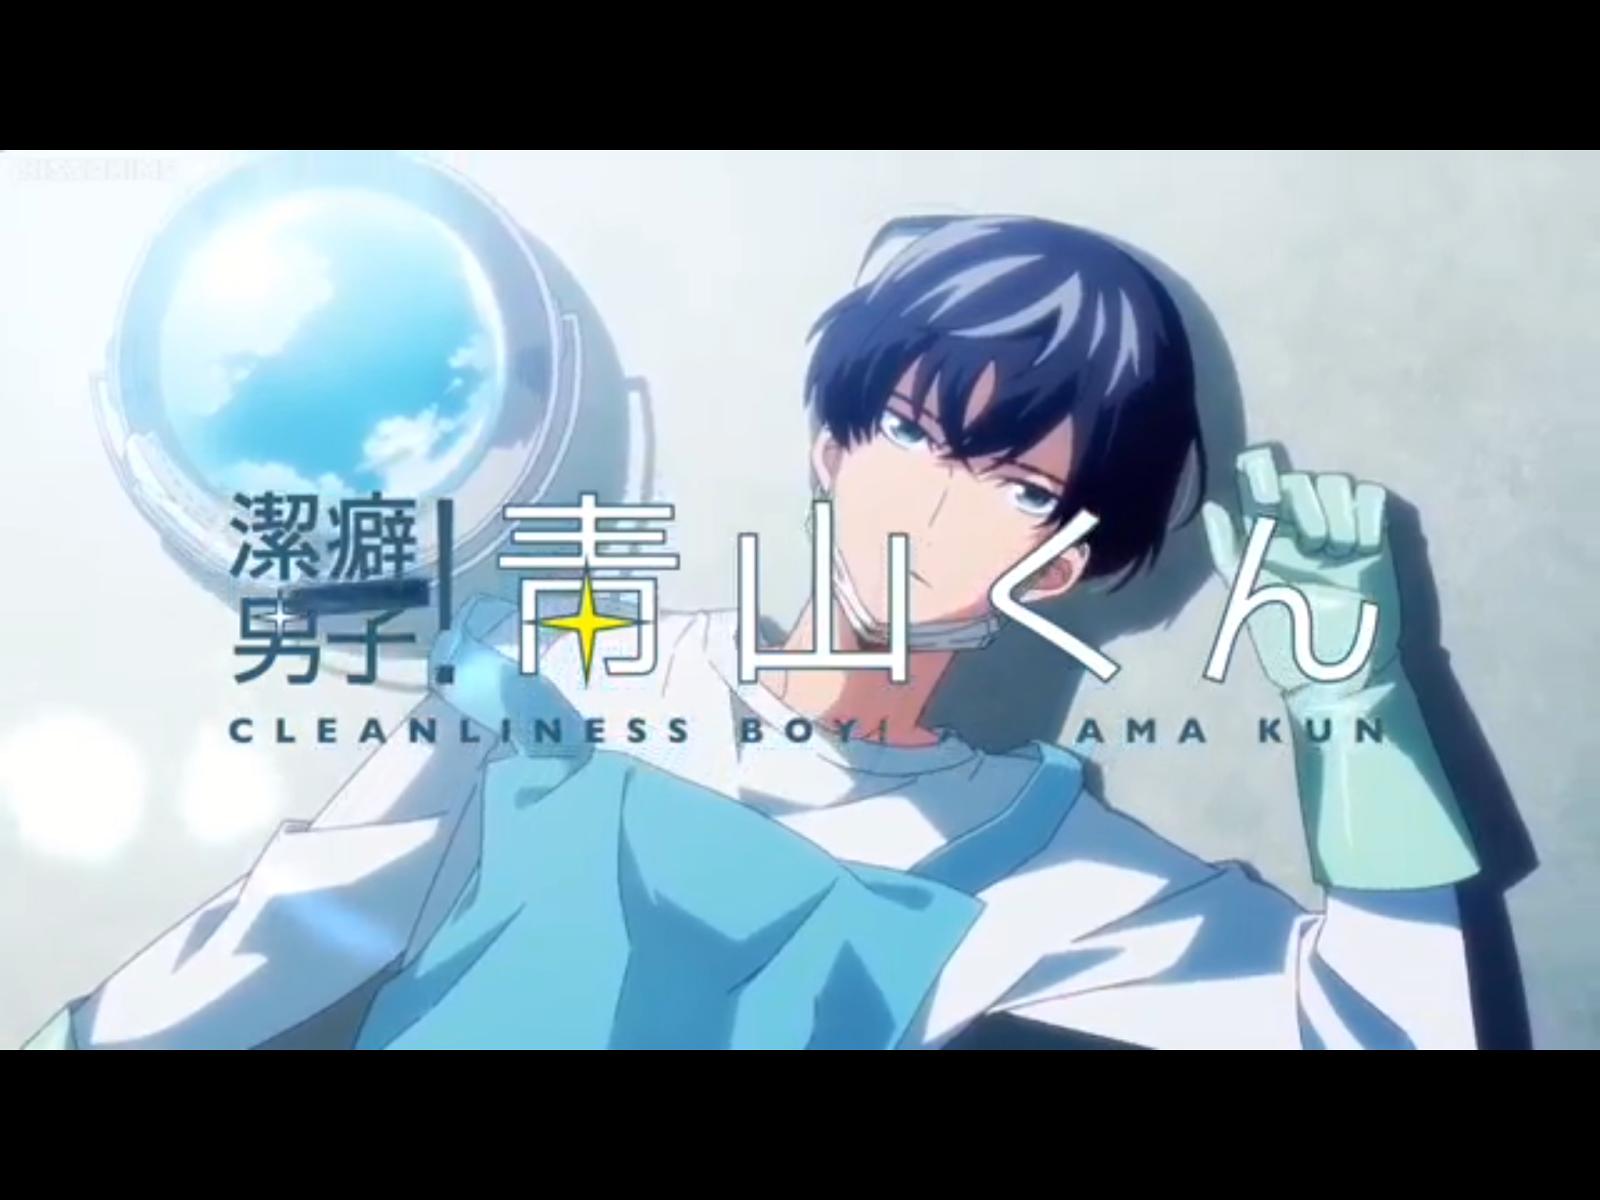 Clean Freak Aoyama Kun Cleanliness Boy Anime